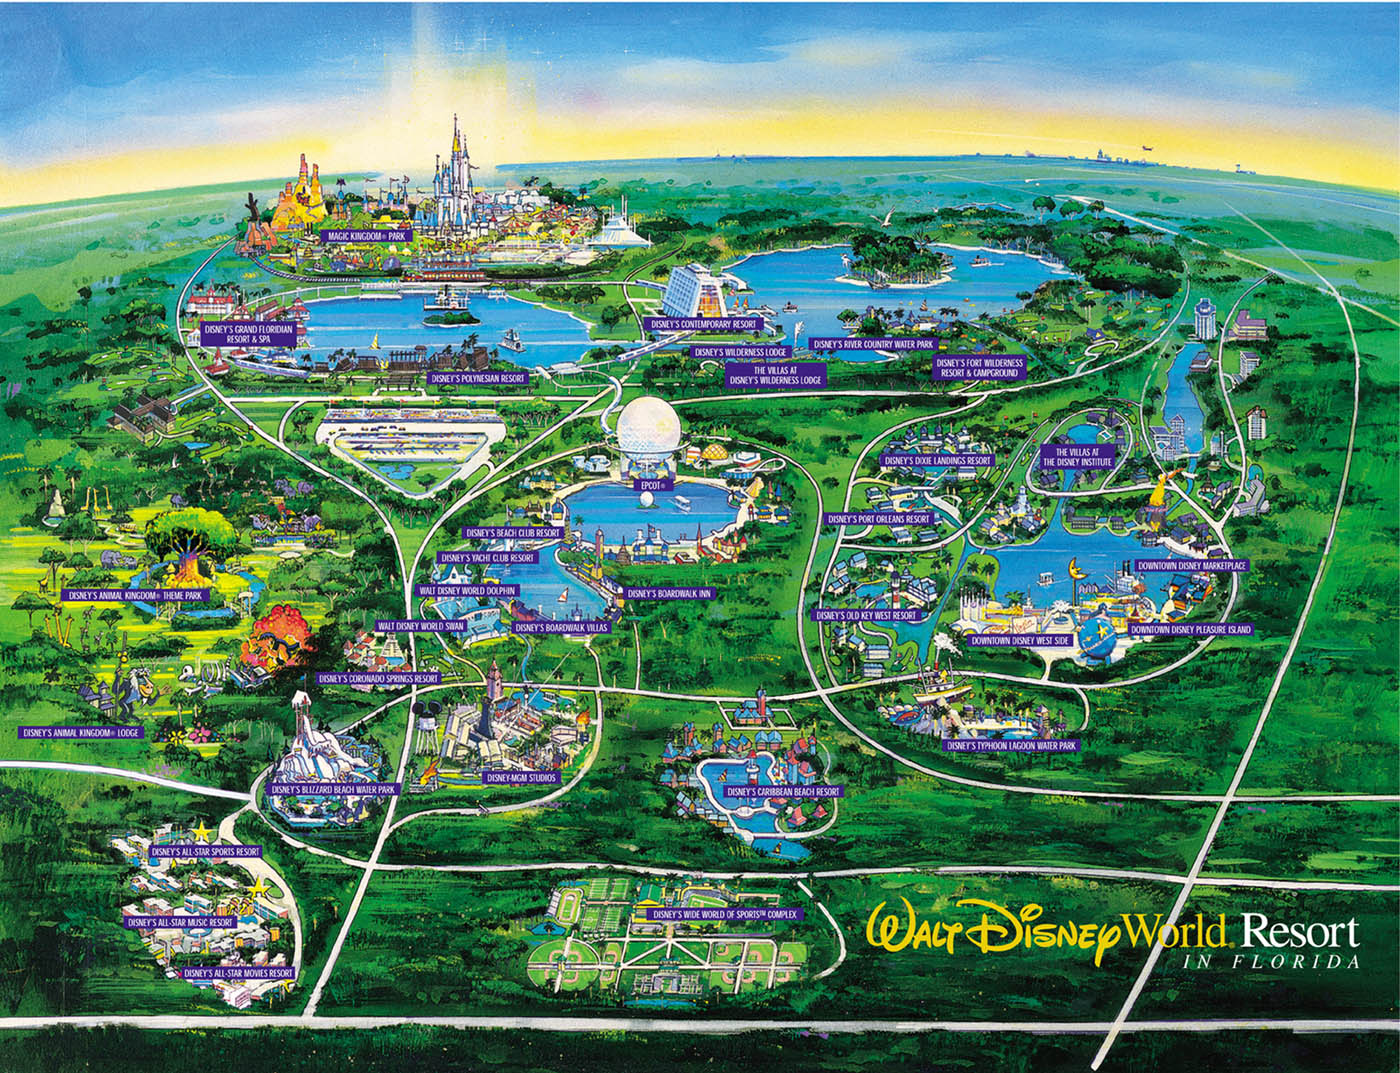 8 Best Images of 2014 Disney World Maps Printable Walt Disney World Resort